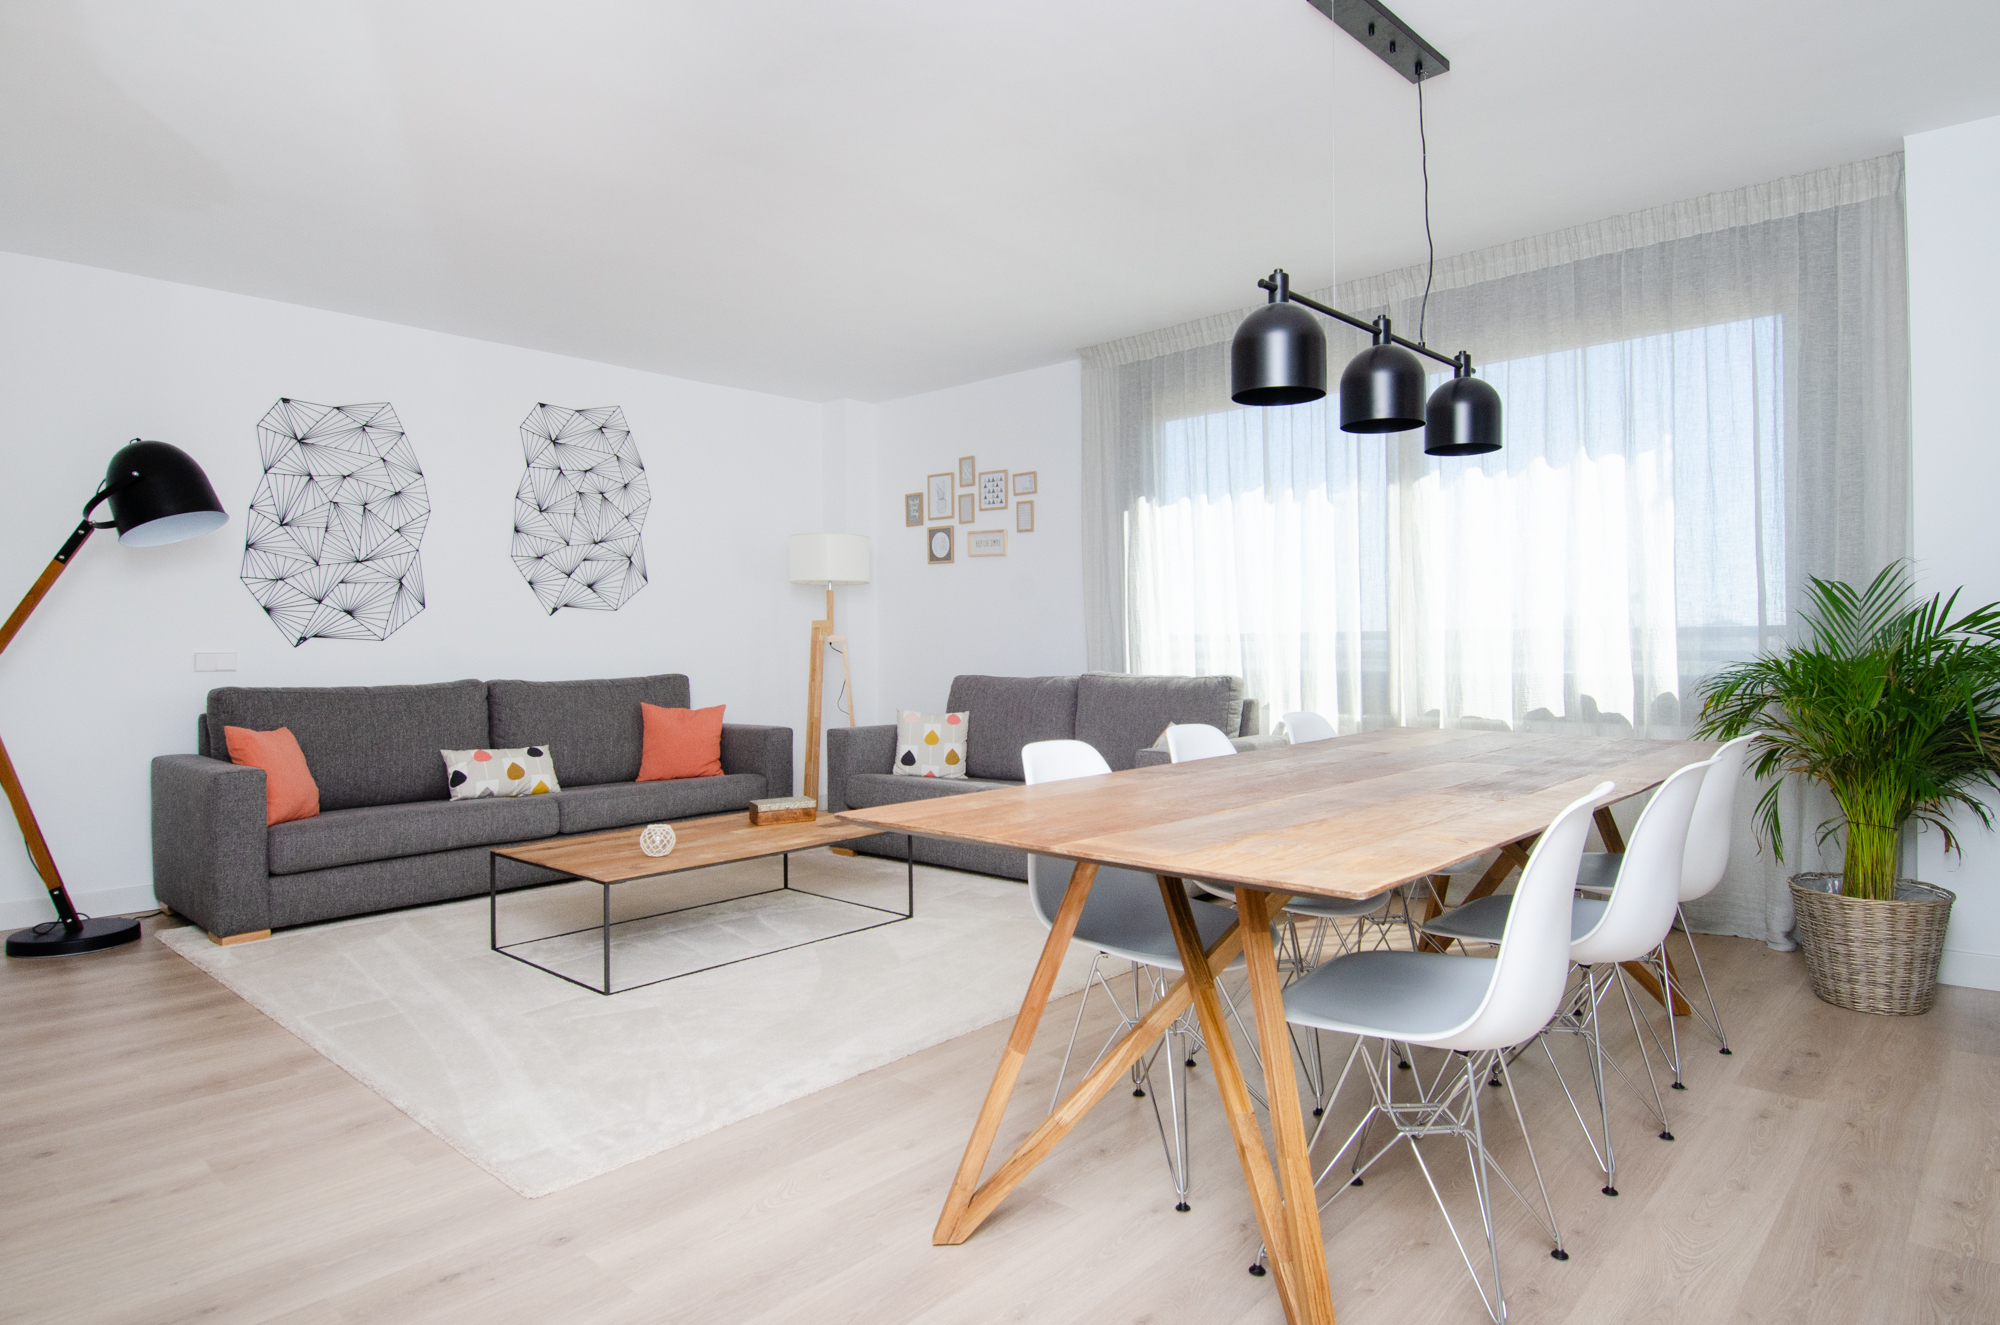 interiorismo-decoracion-ana-de-cabo-reforma-piso-santa-eugenia (14)